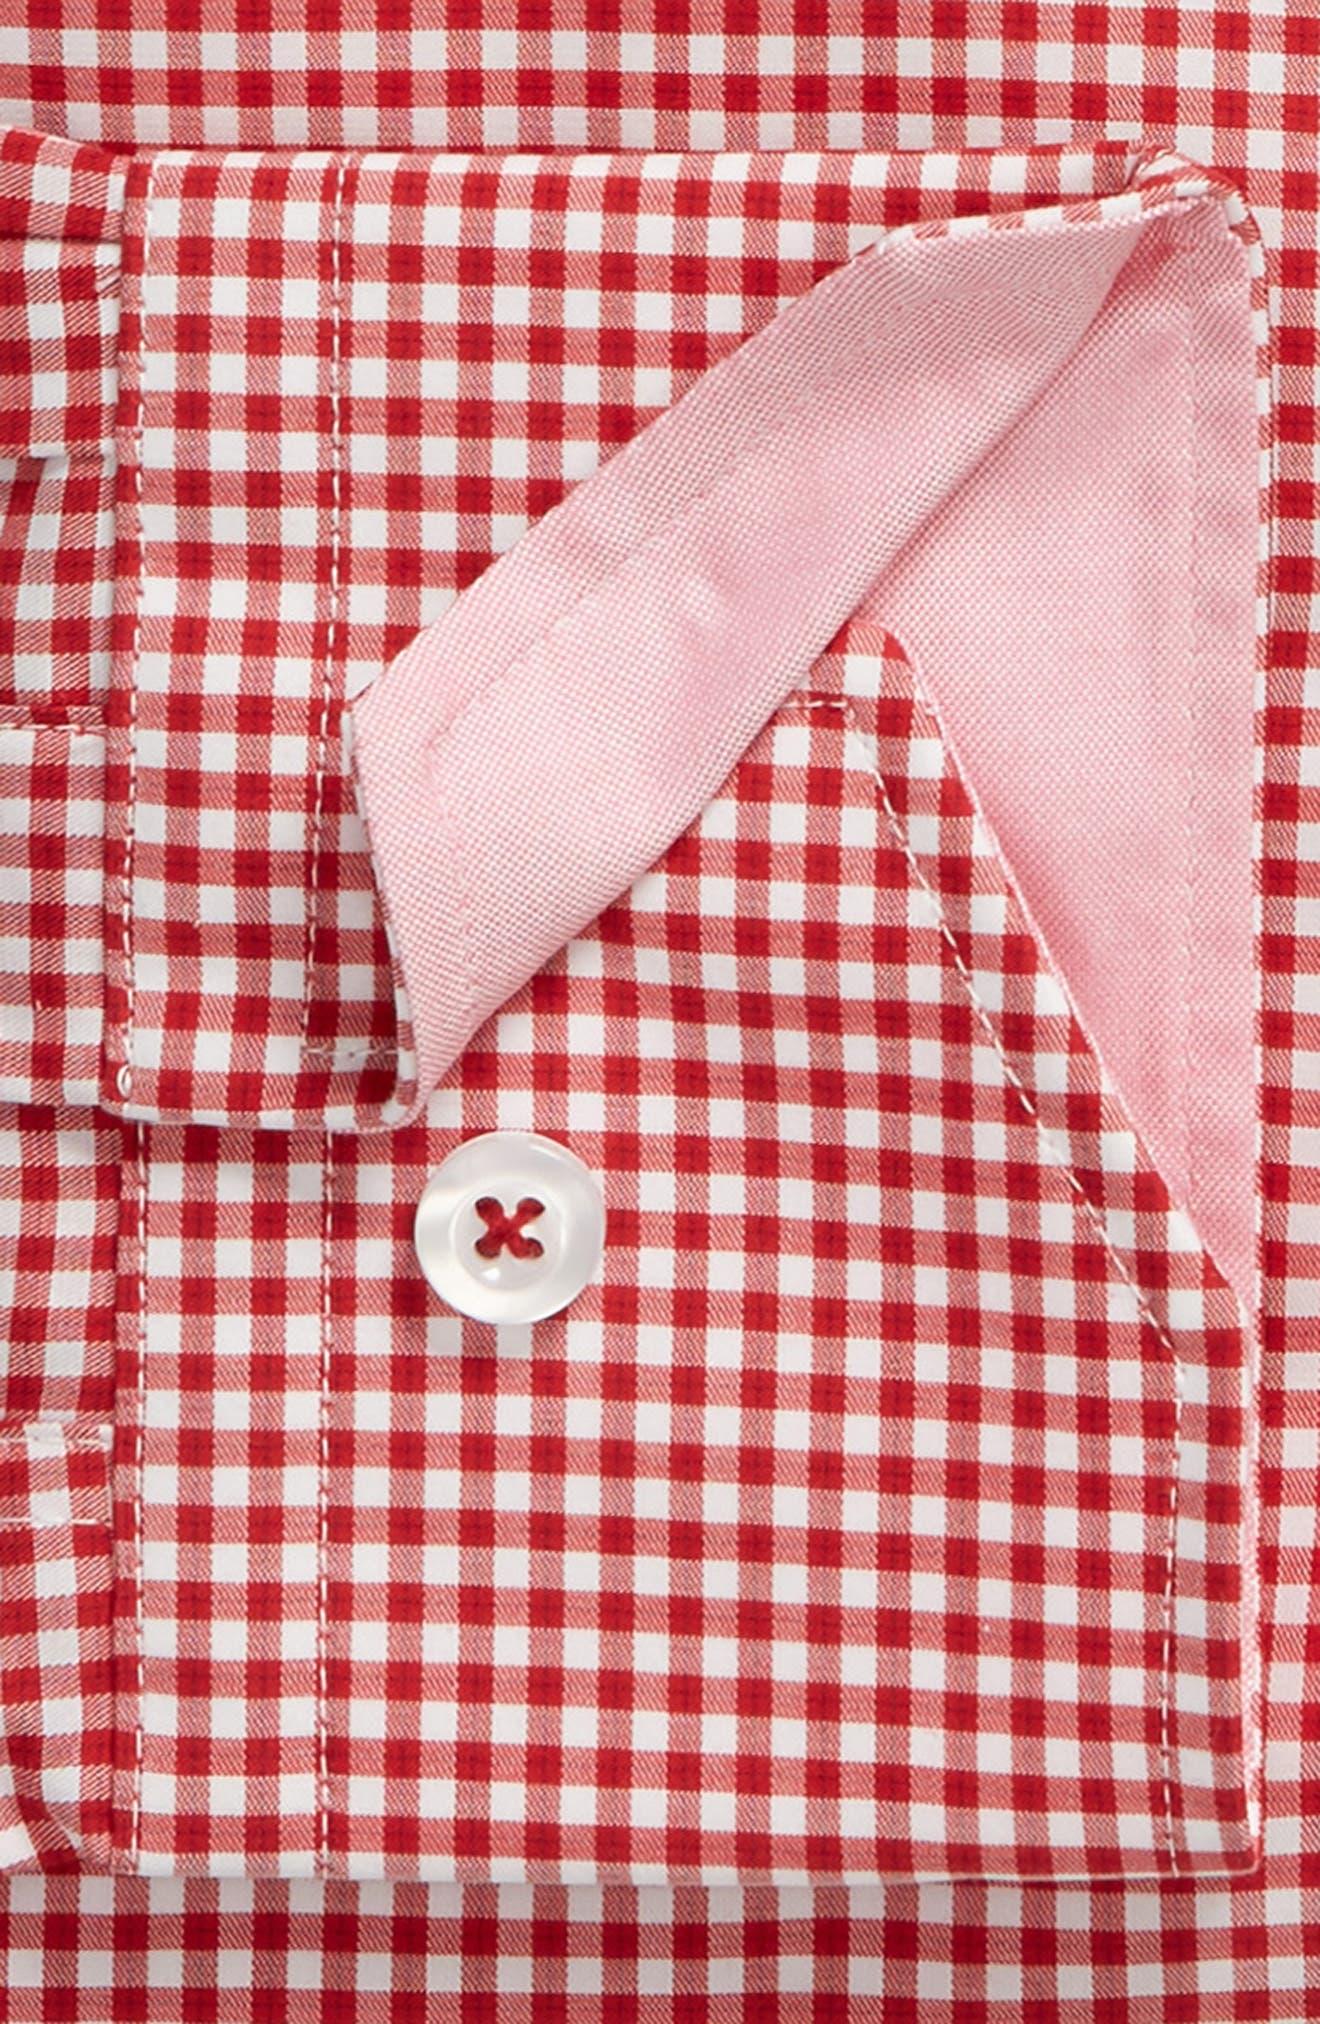 Trim Fit Check Dress Shirt,                             Alternate thumbnail 6, color,                             RED